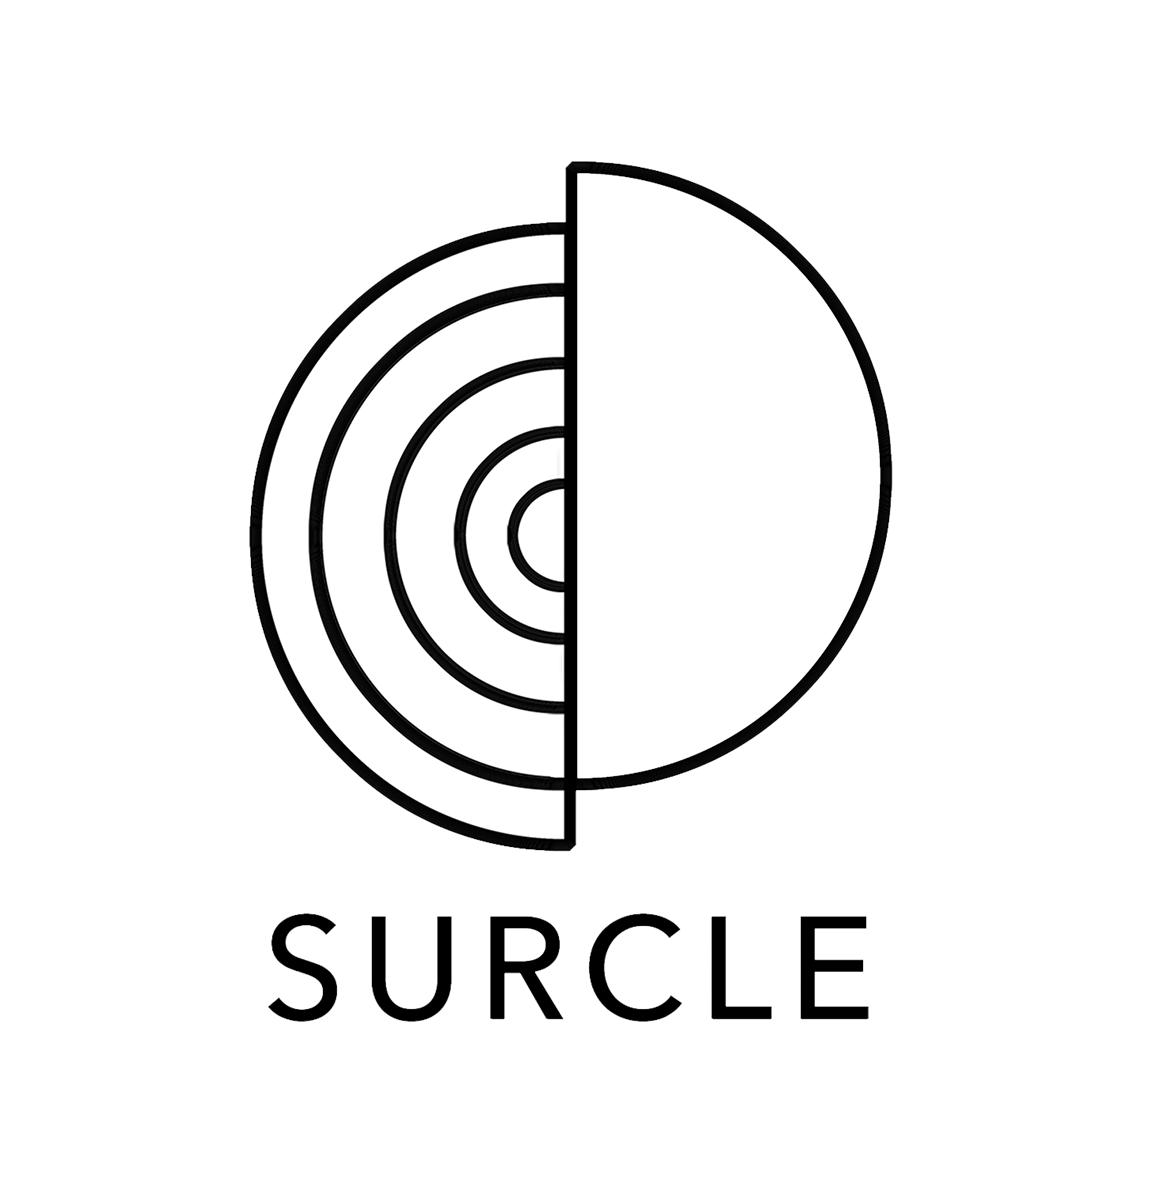 surclemark.png